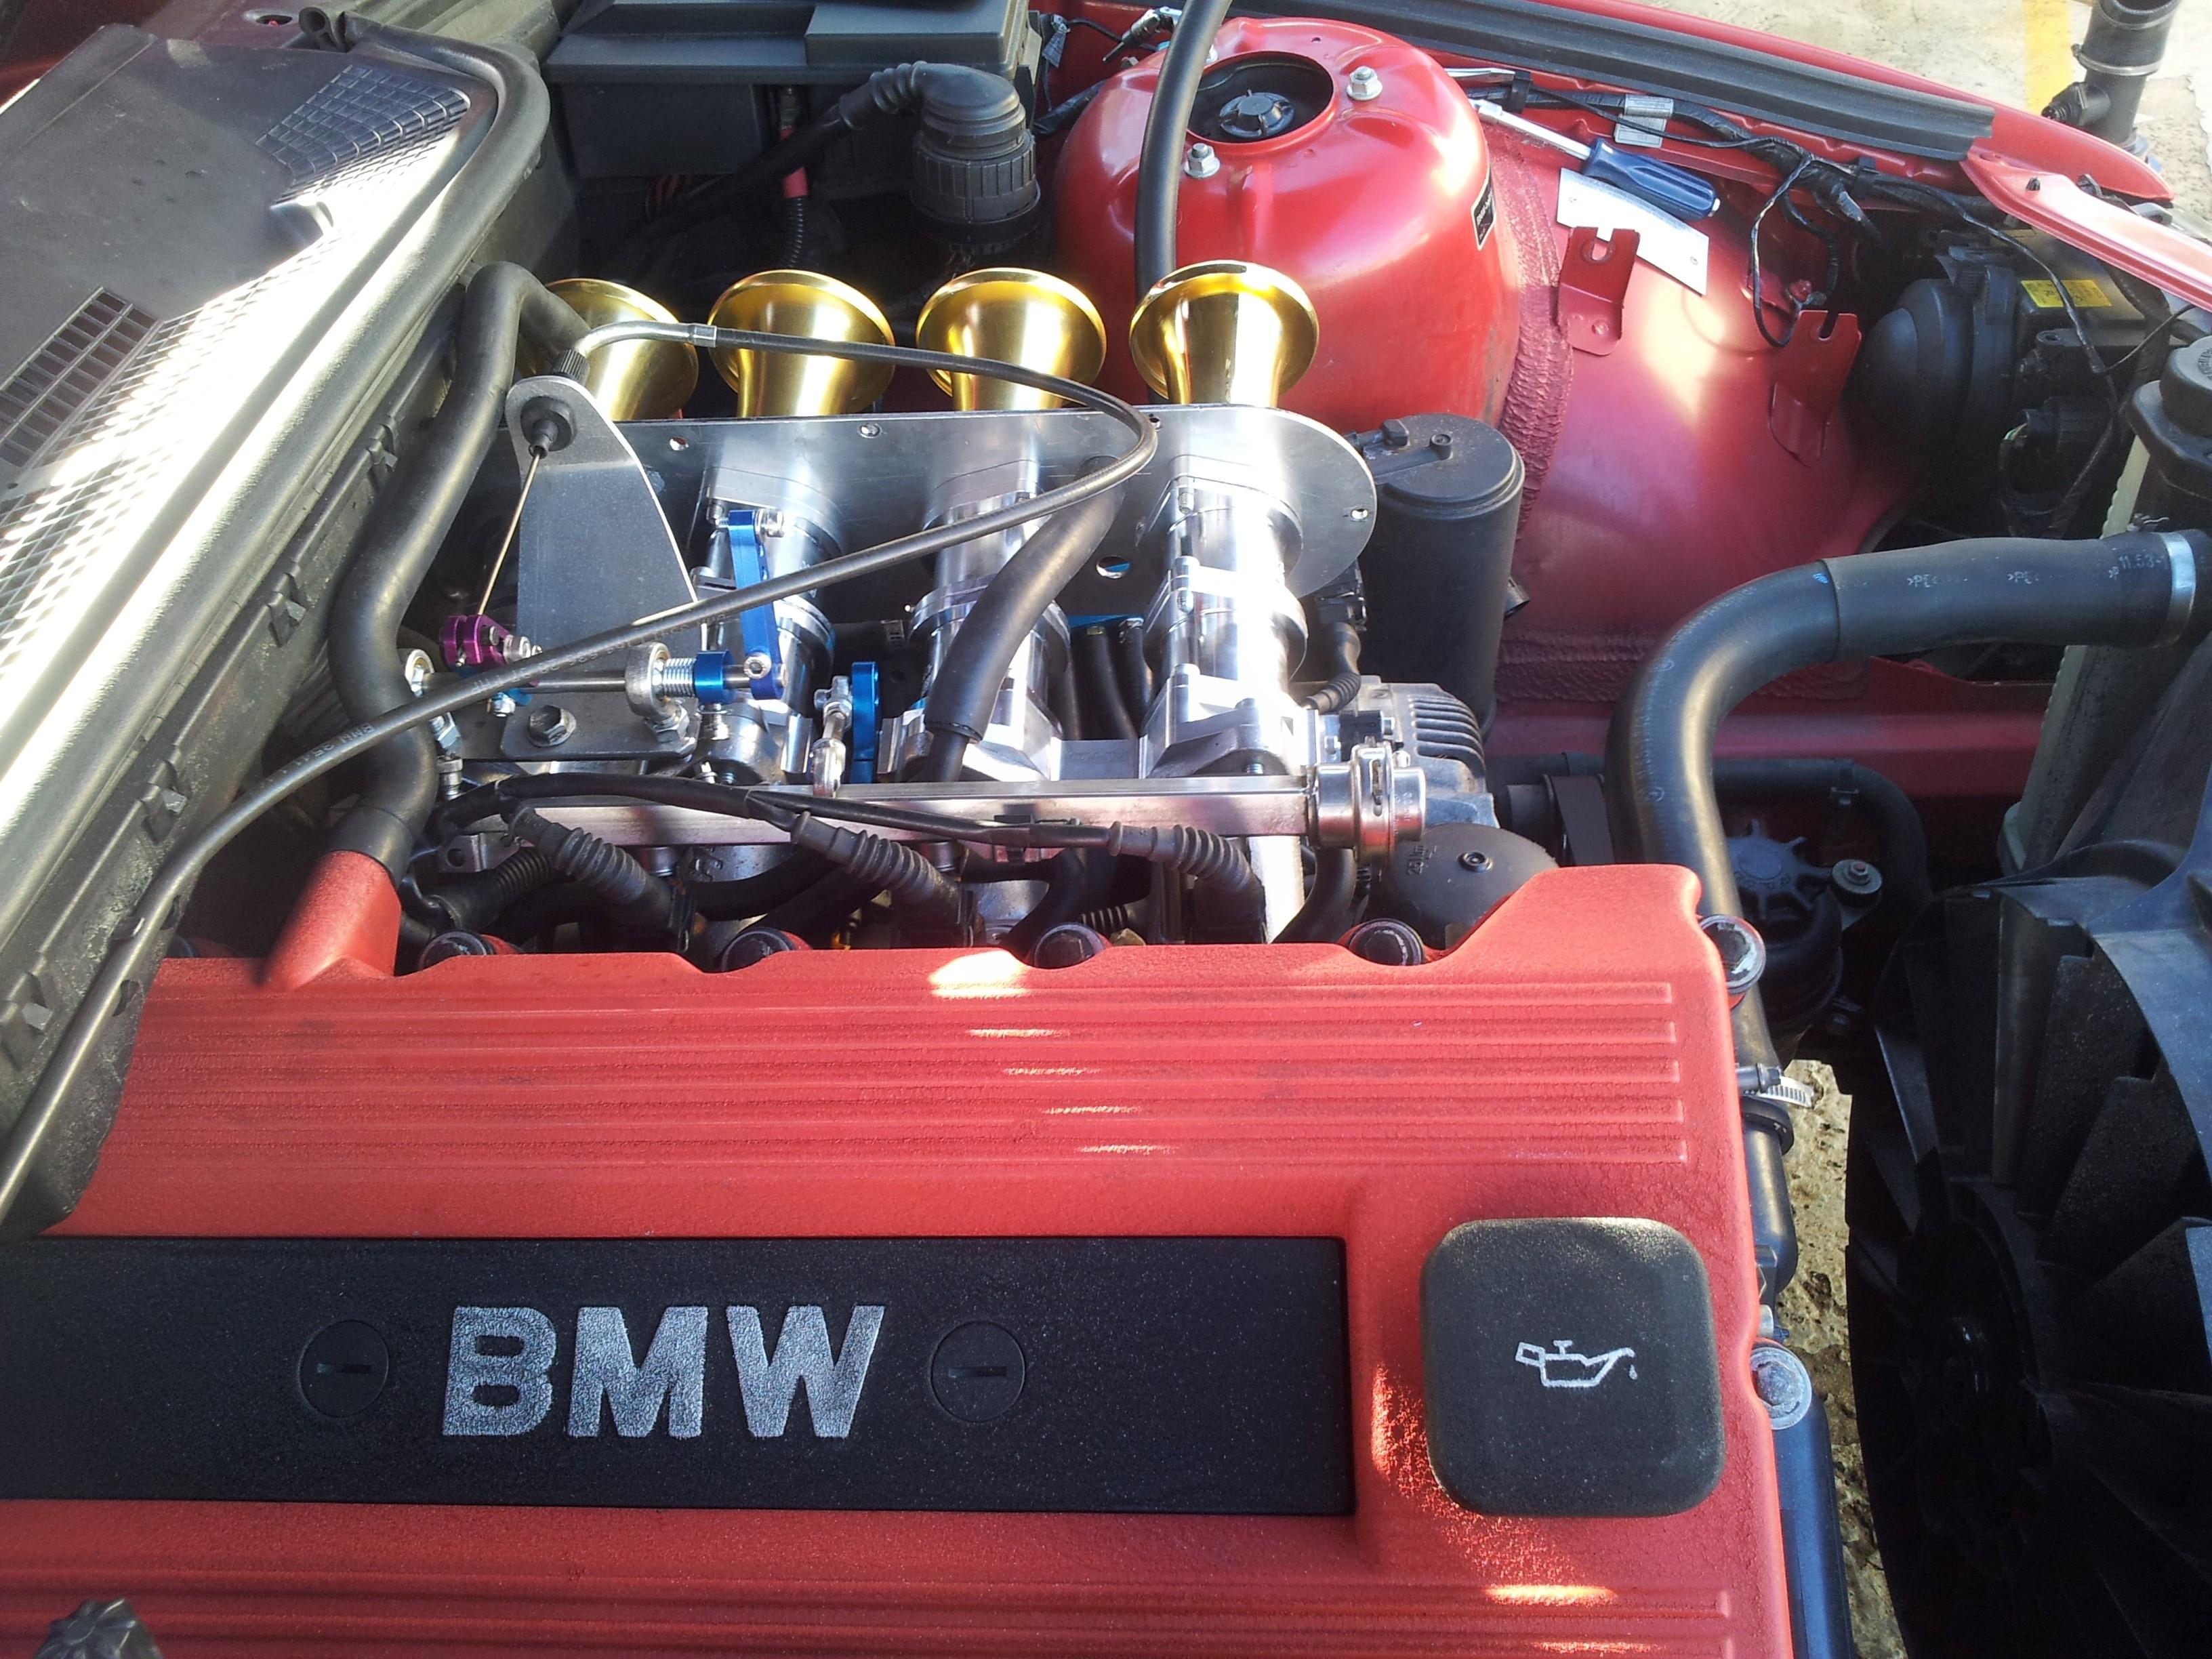 Bmw M44 Engine Diagram Rhd Engineering Of Bmw M44 Engine Diagram Bmw Z3  Drive Belt Replacement